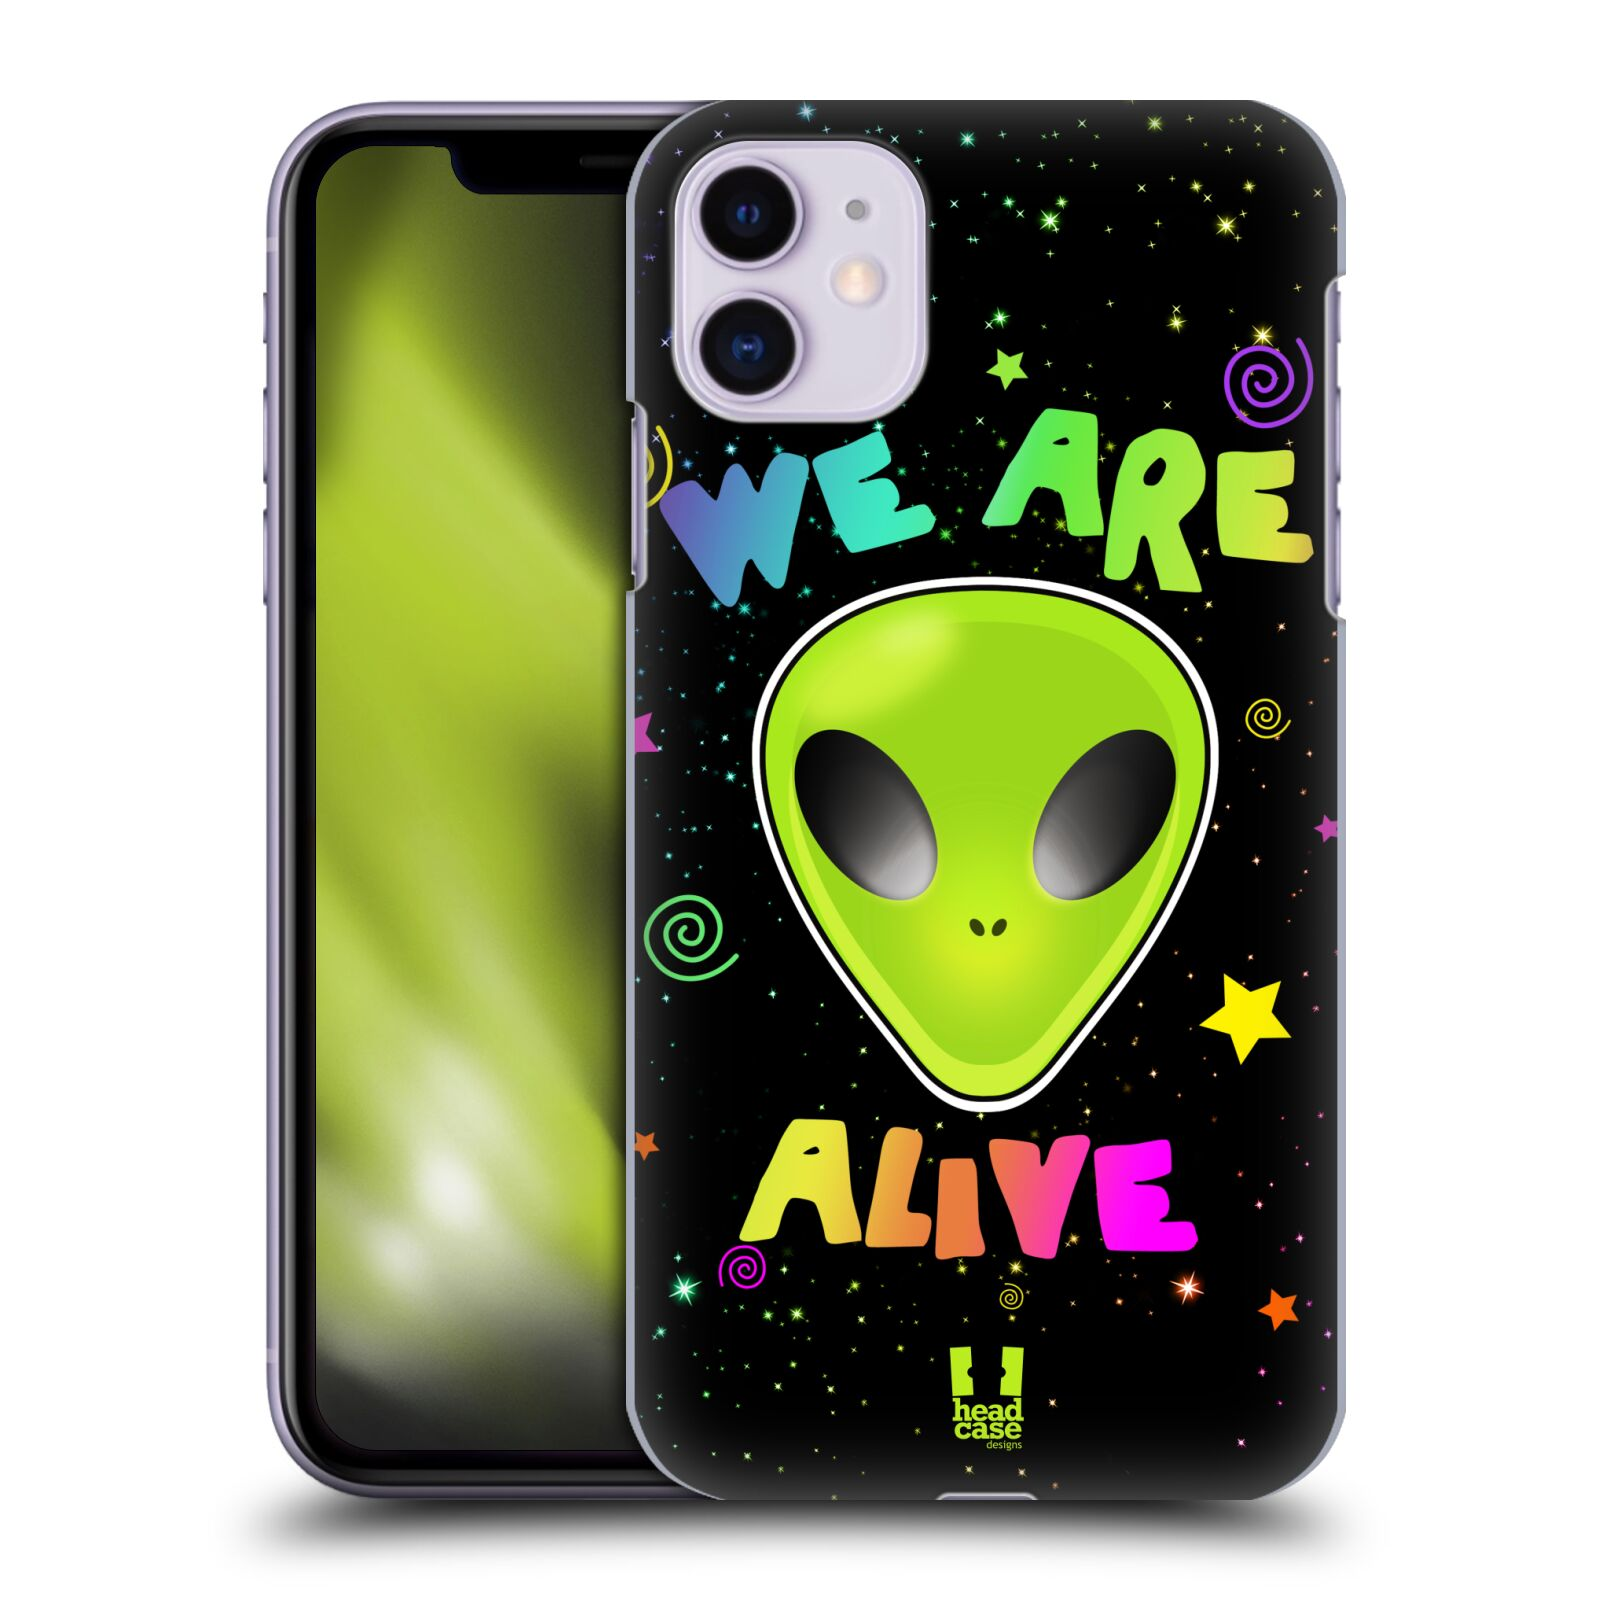 Plastové pouzdro na mobil Apple iPhone 11 - Head Case - ALIENS ALIVE